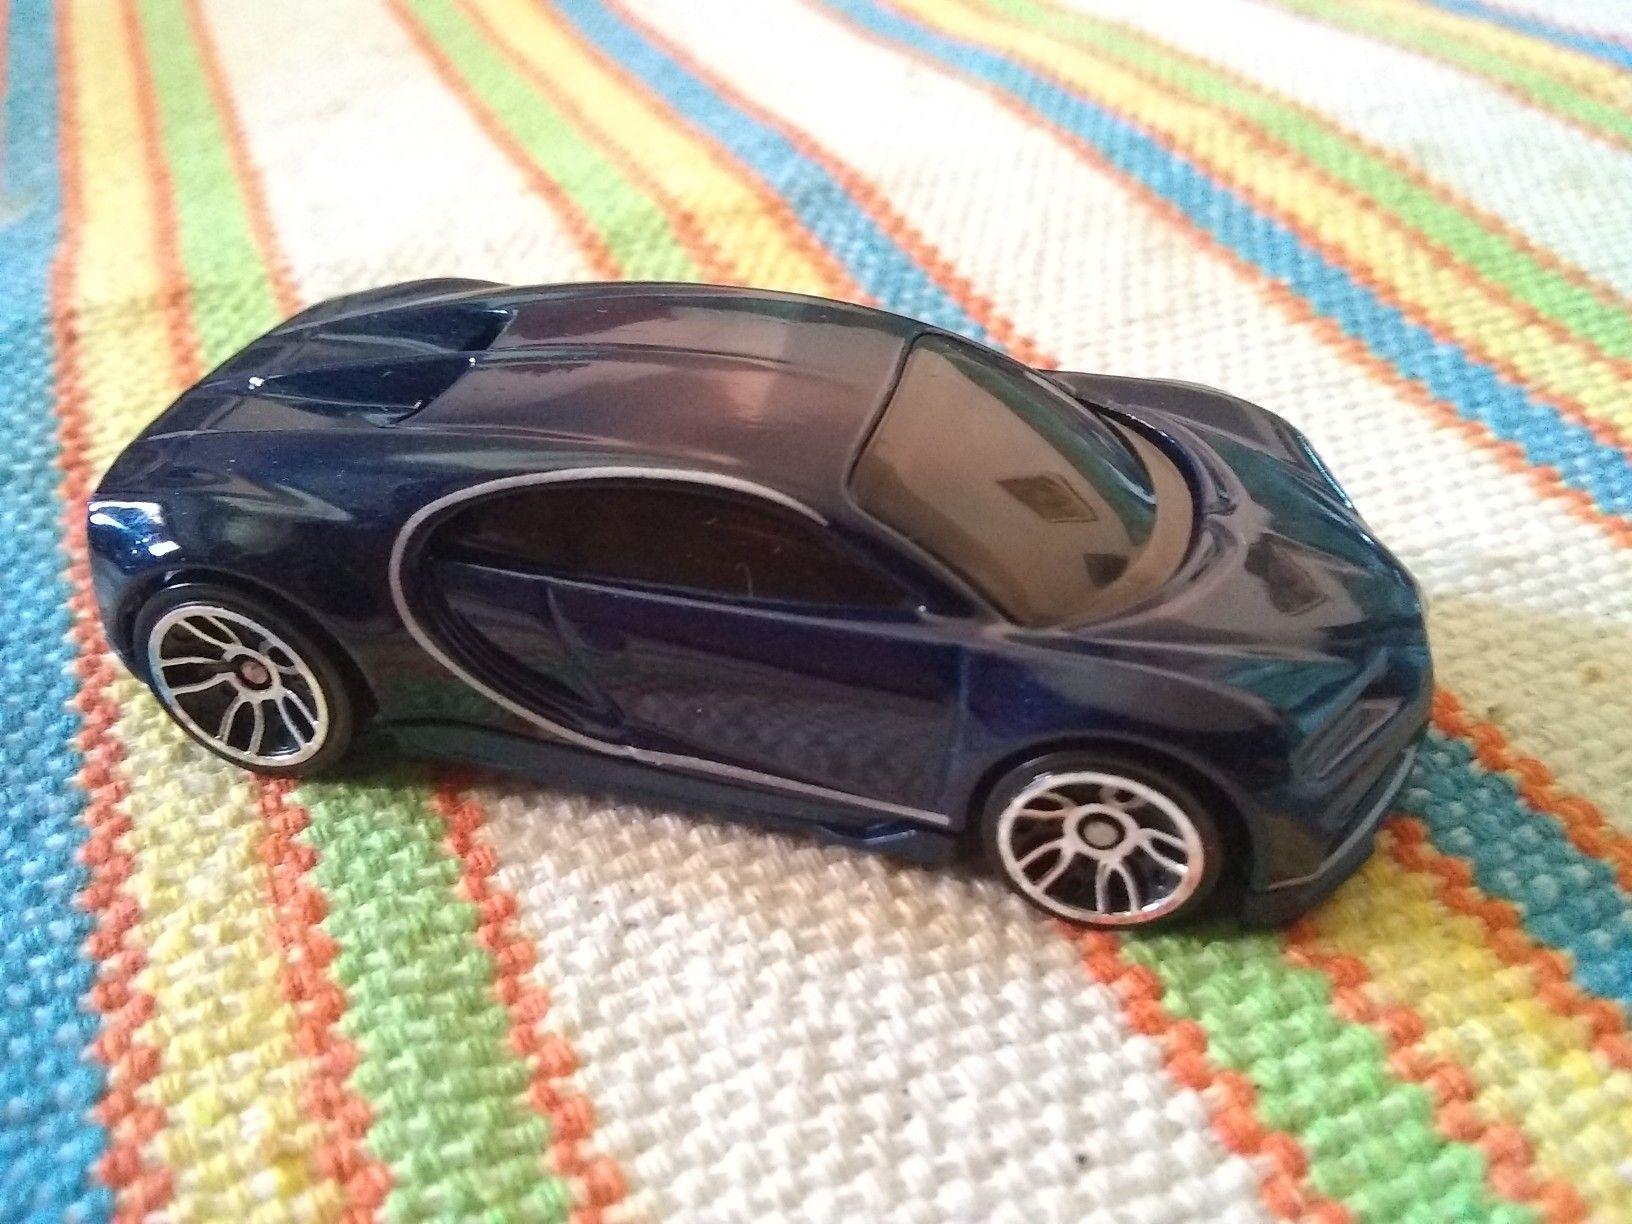 16 Bugatti Chiron Hot Wheels Bugatti Chiron Toy Car